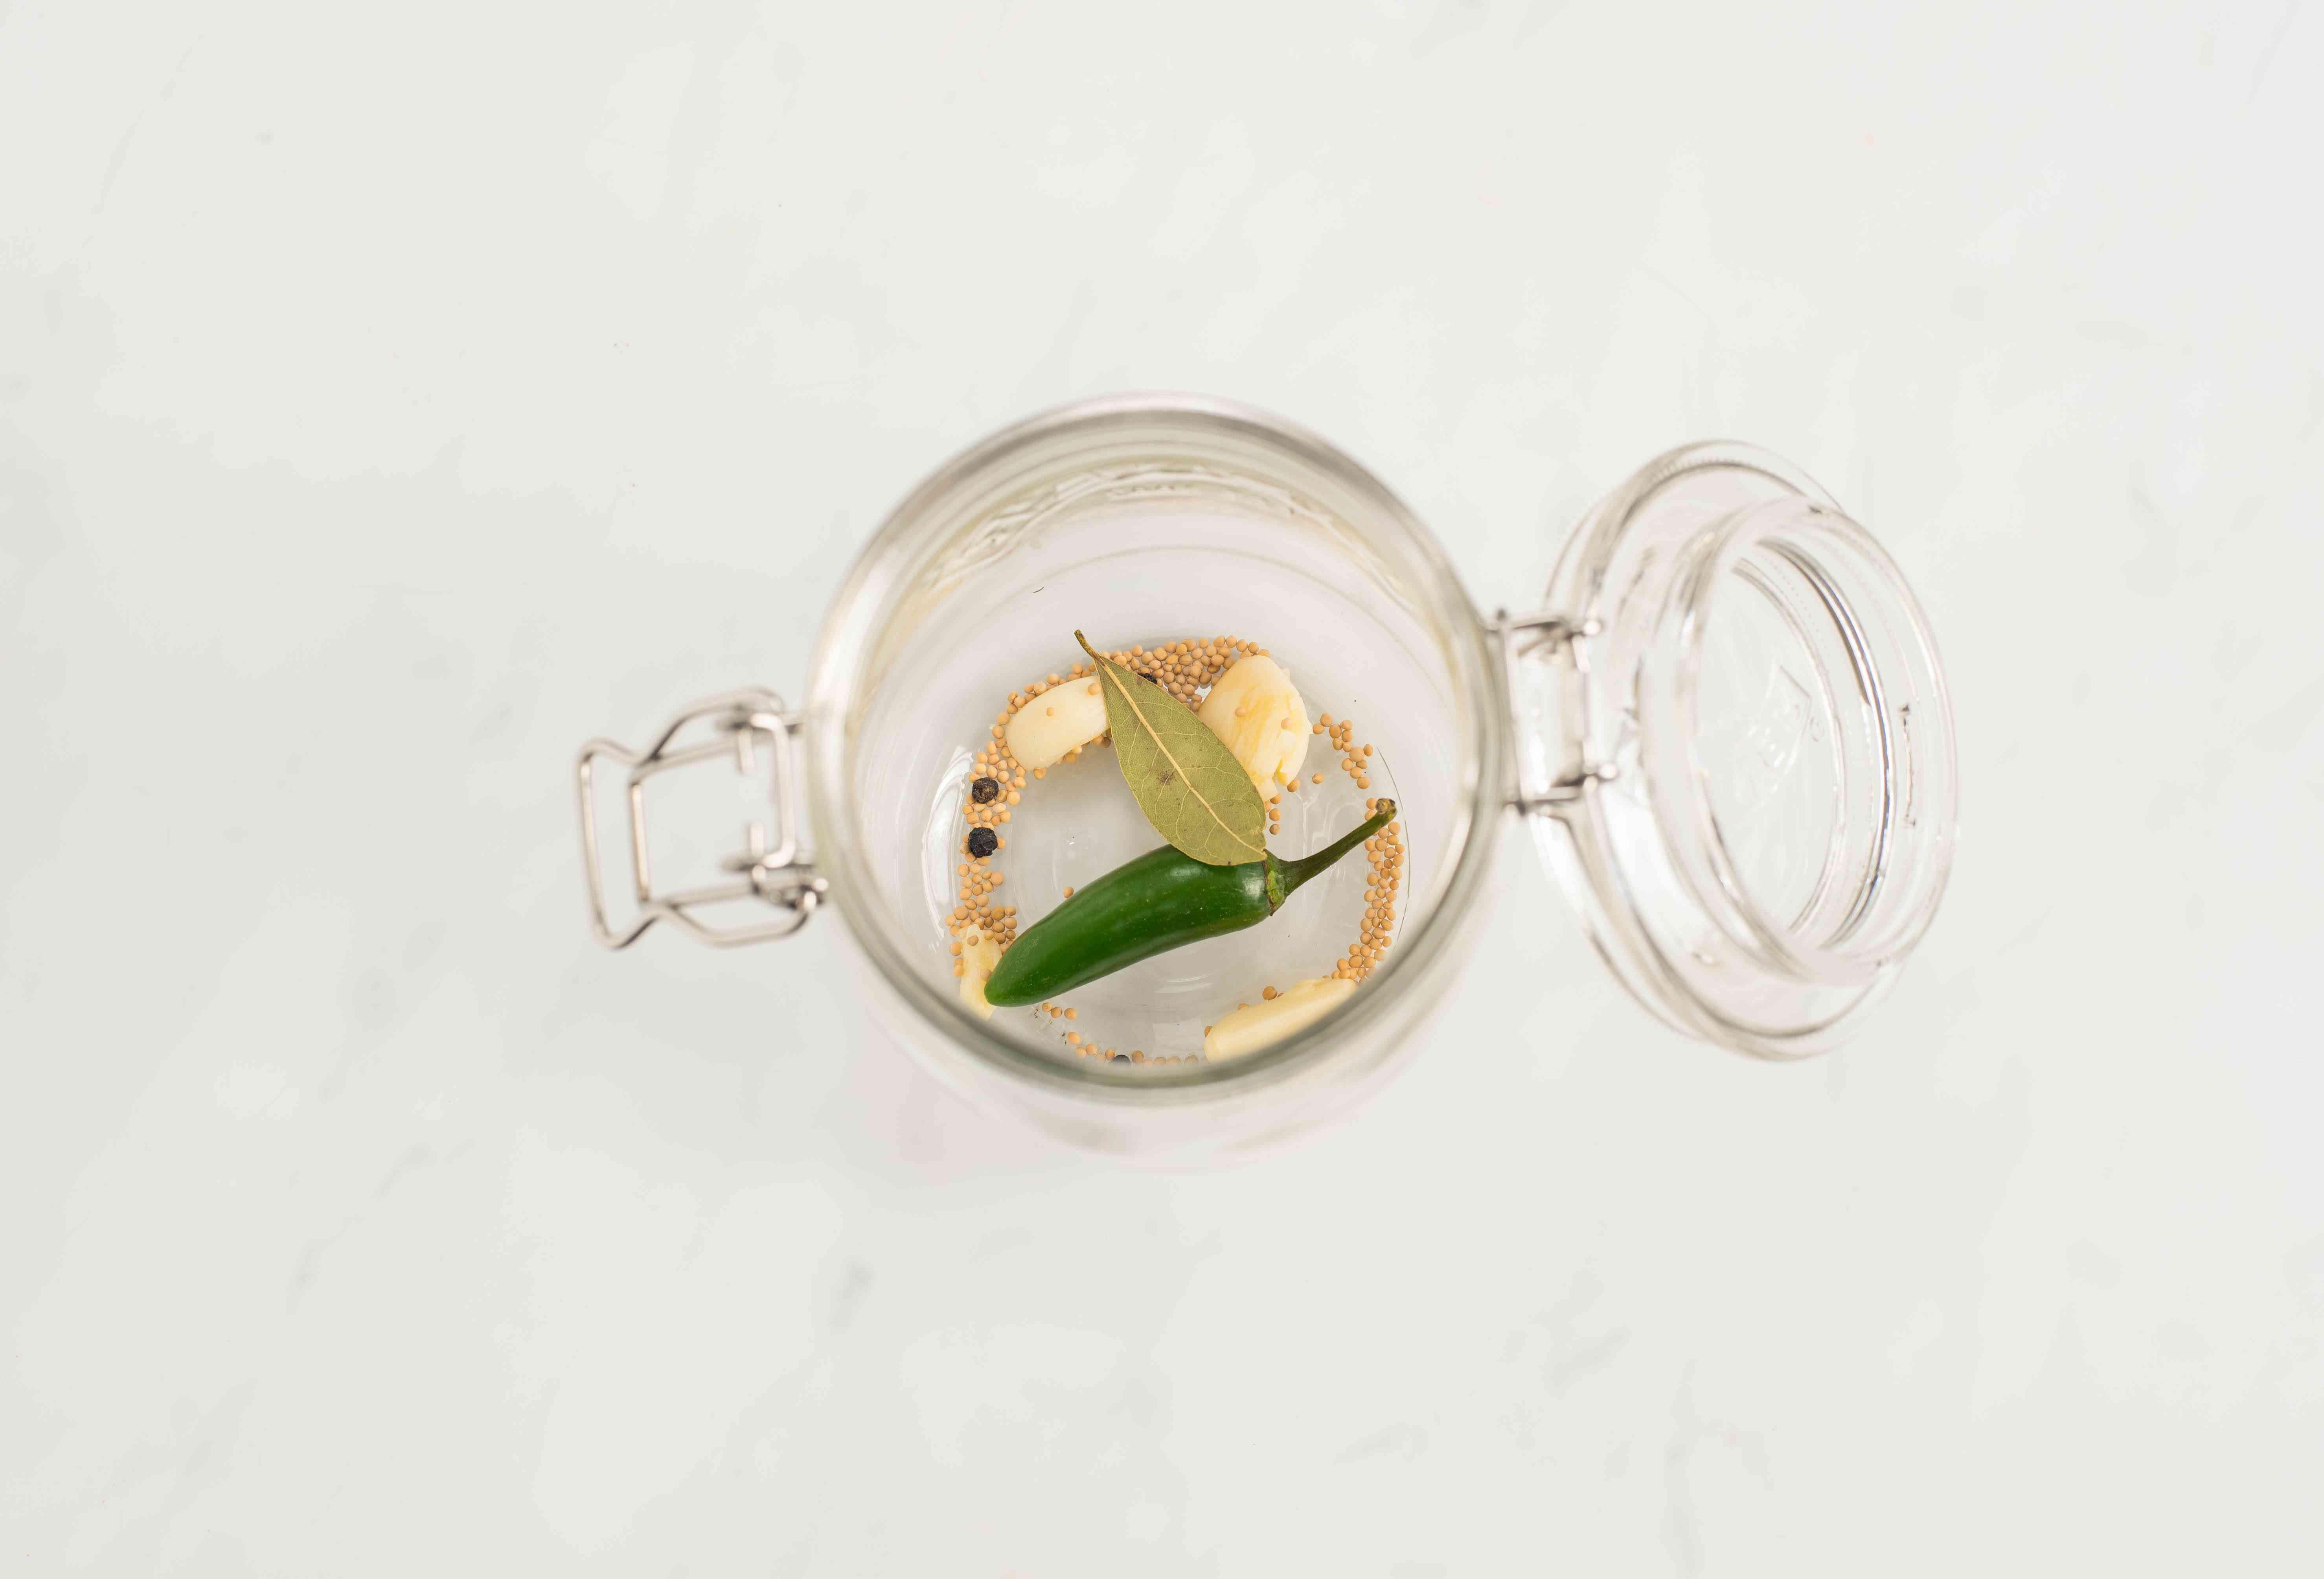 Put spices in jar